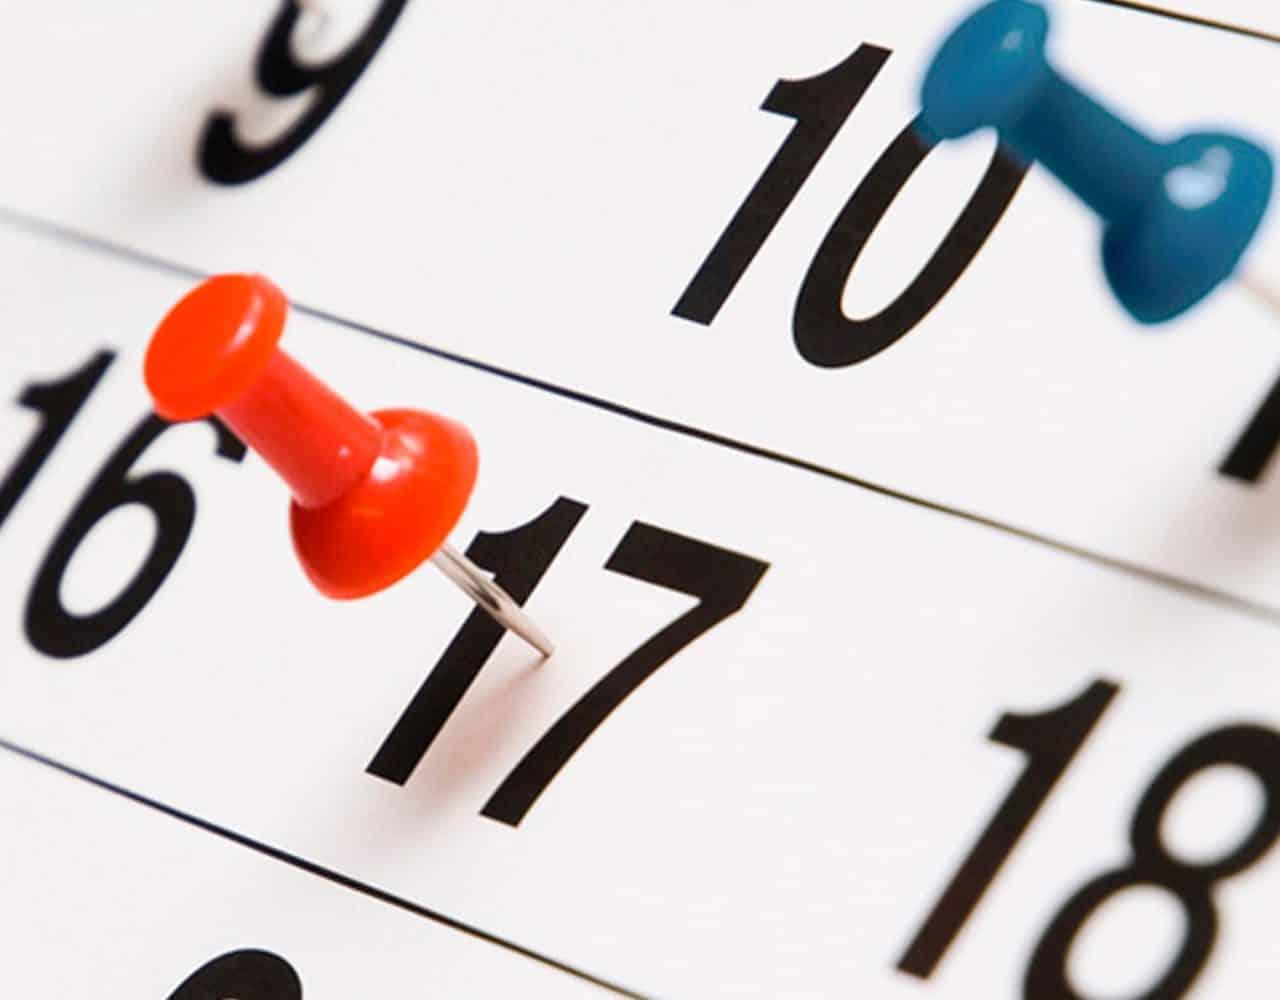 home_kalender-1280x1000